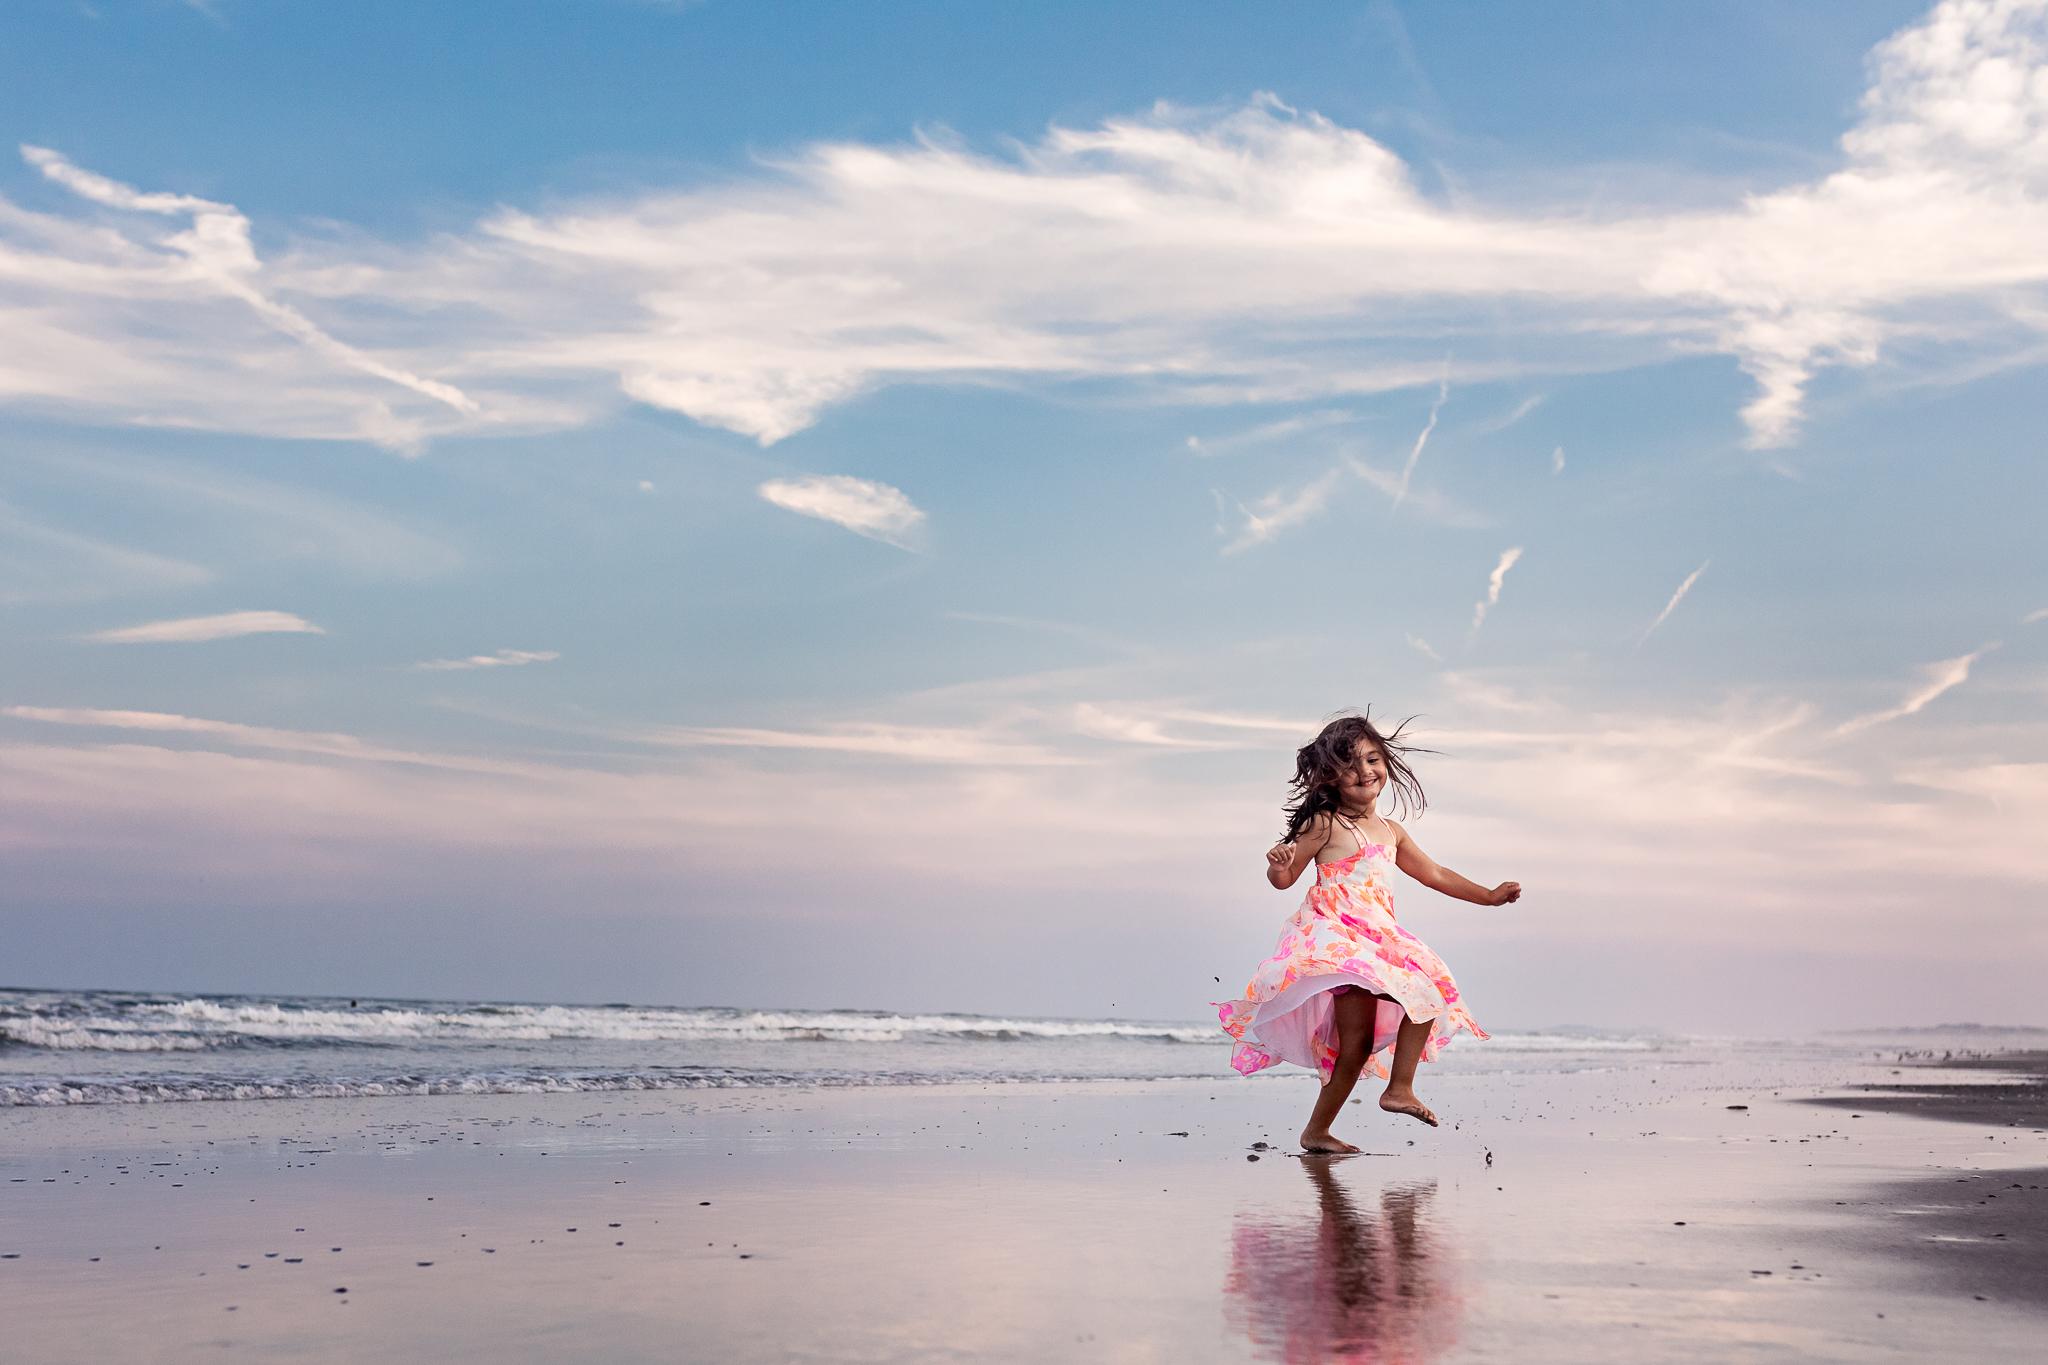 NancyElizabethPhotography, South Jersey Photographer, Girl Spinning on New Jersey Beach